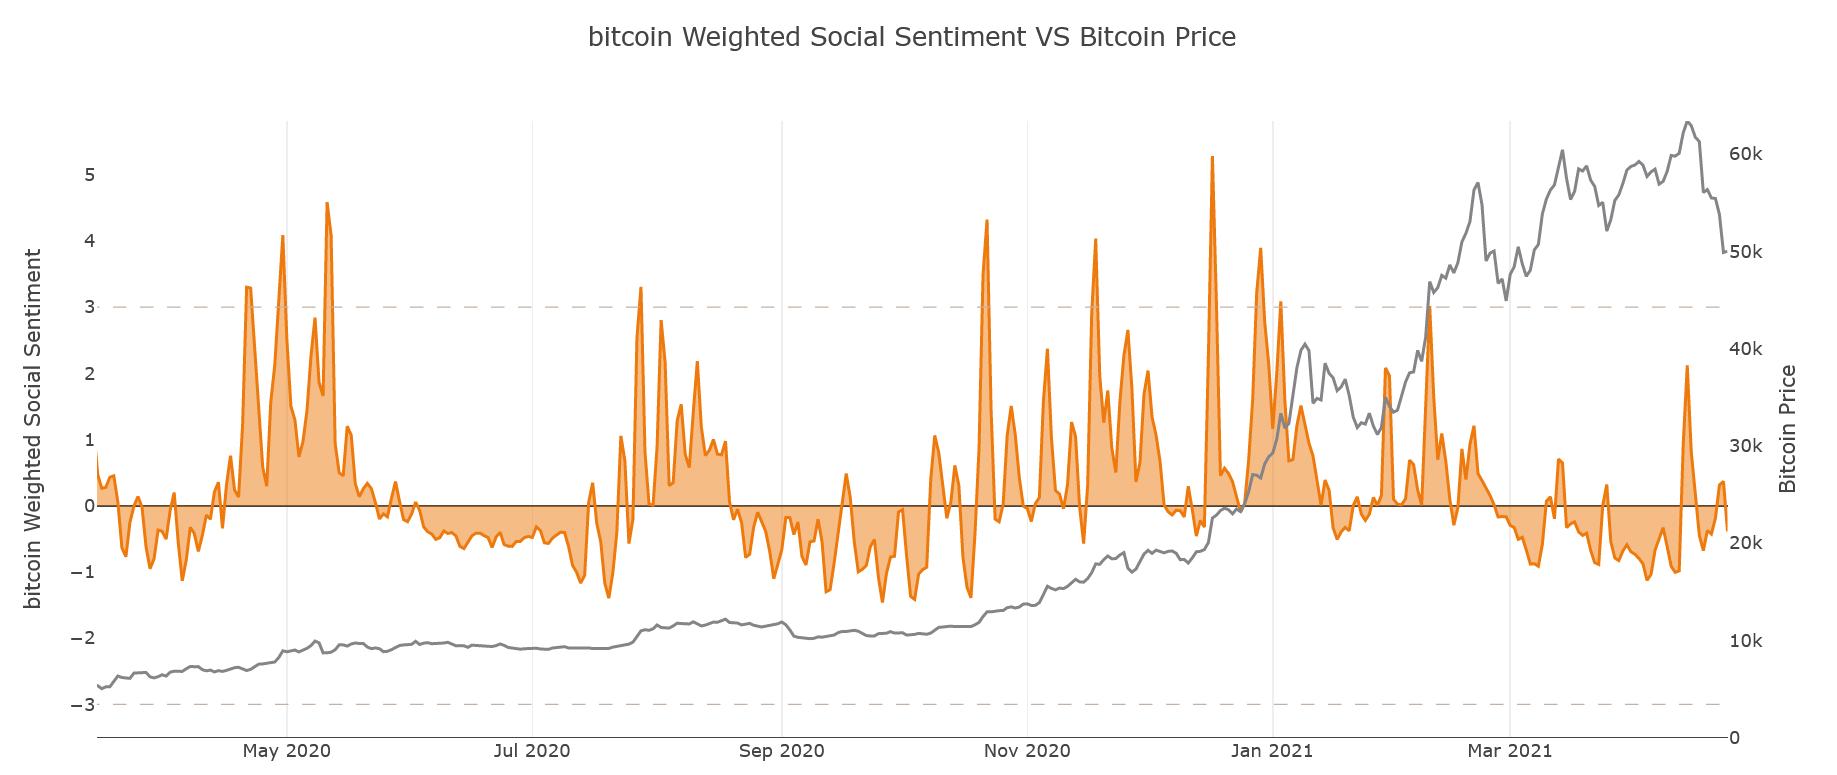 Bitcoin social sentiment